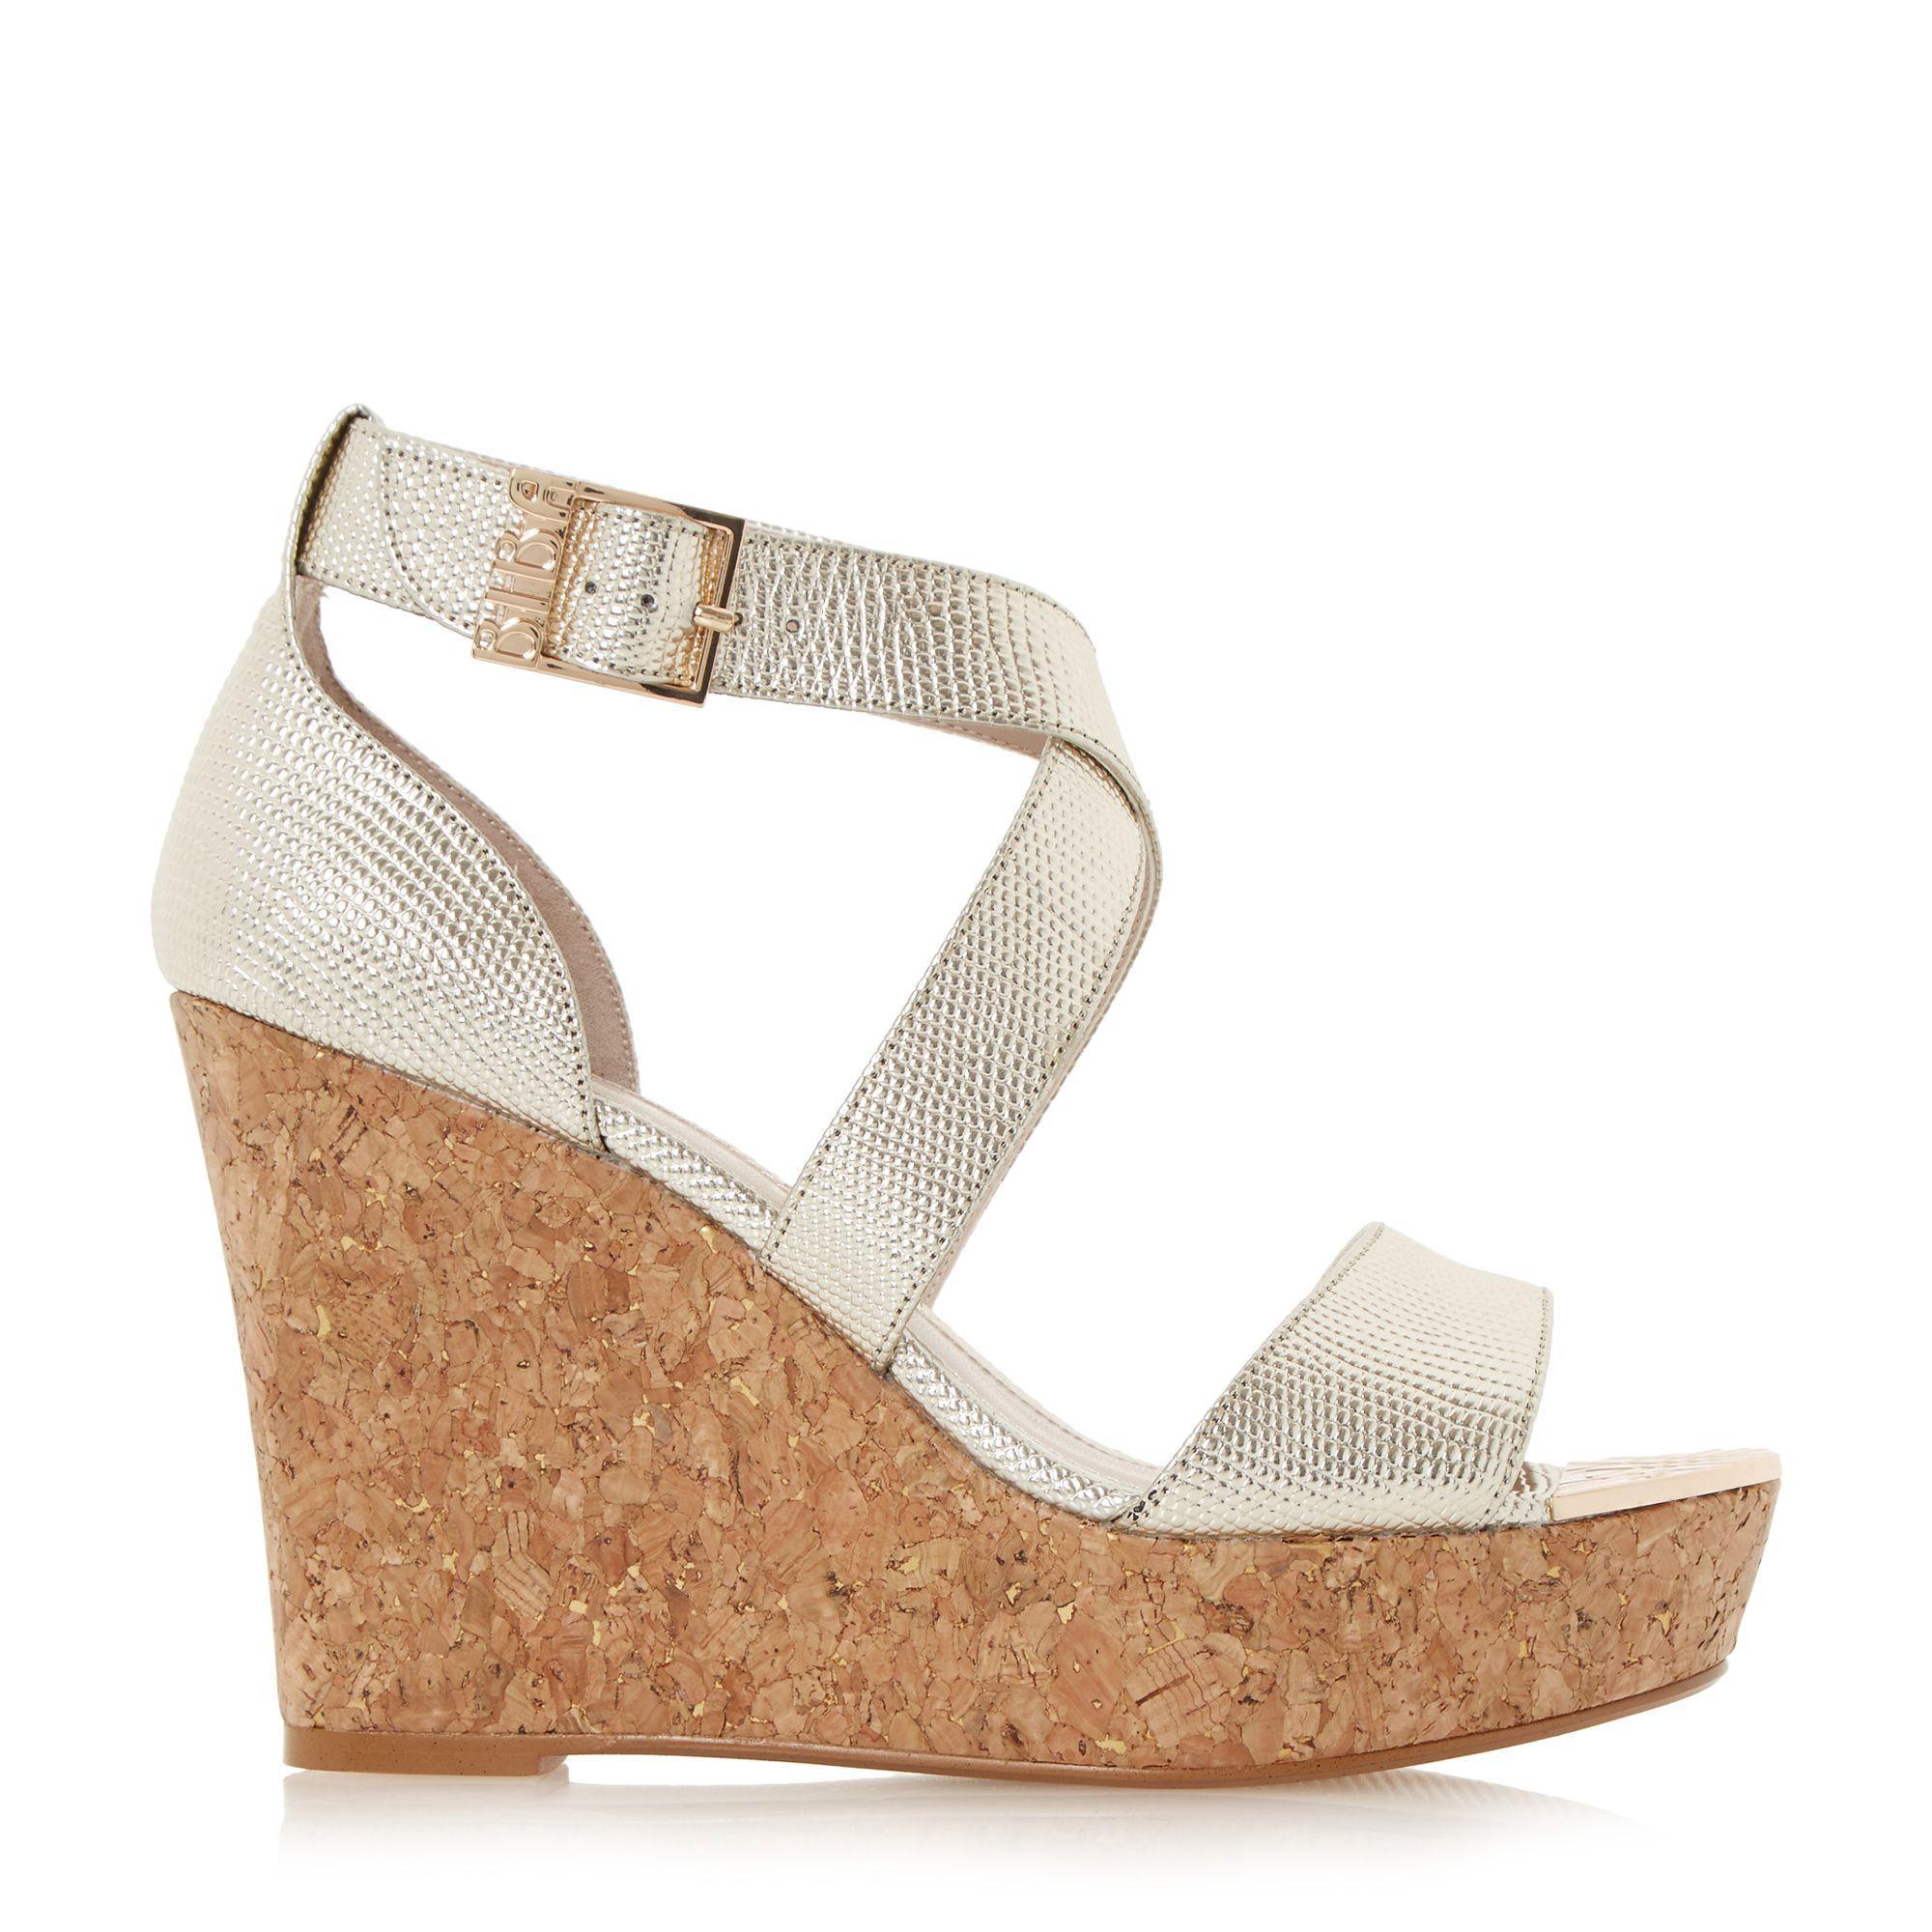 Biba Kanya Strap Wedge Sandals In Metallic Lyst